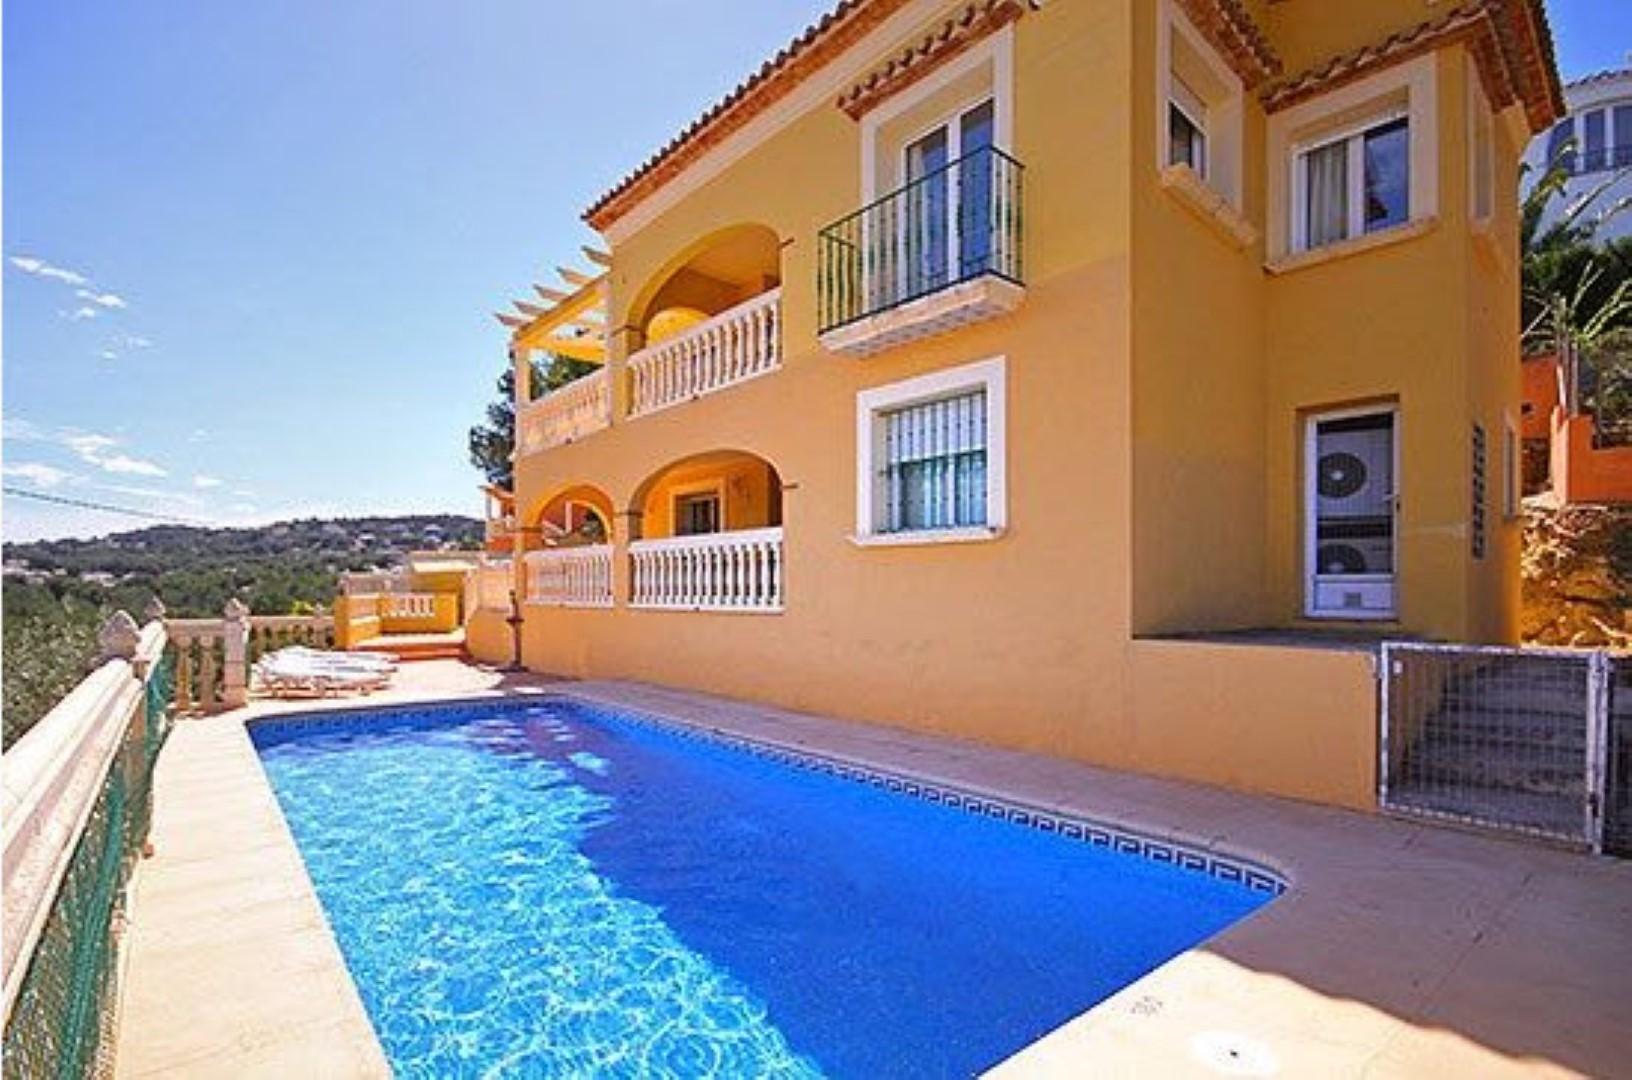 26 Bedroom Villa in Javea